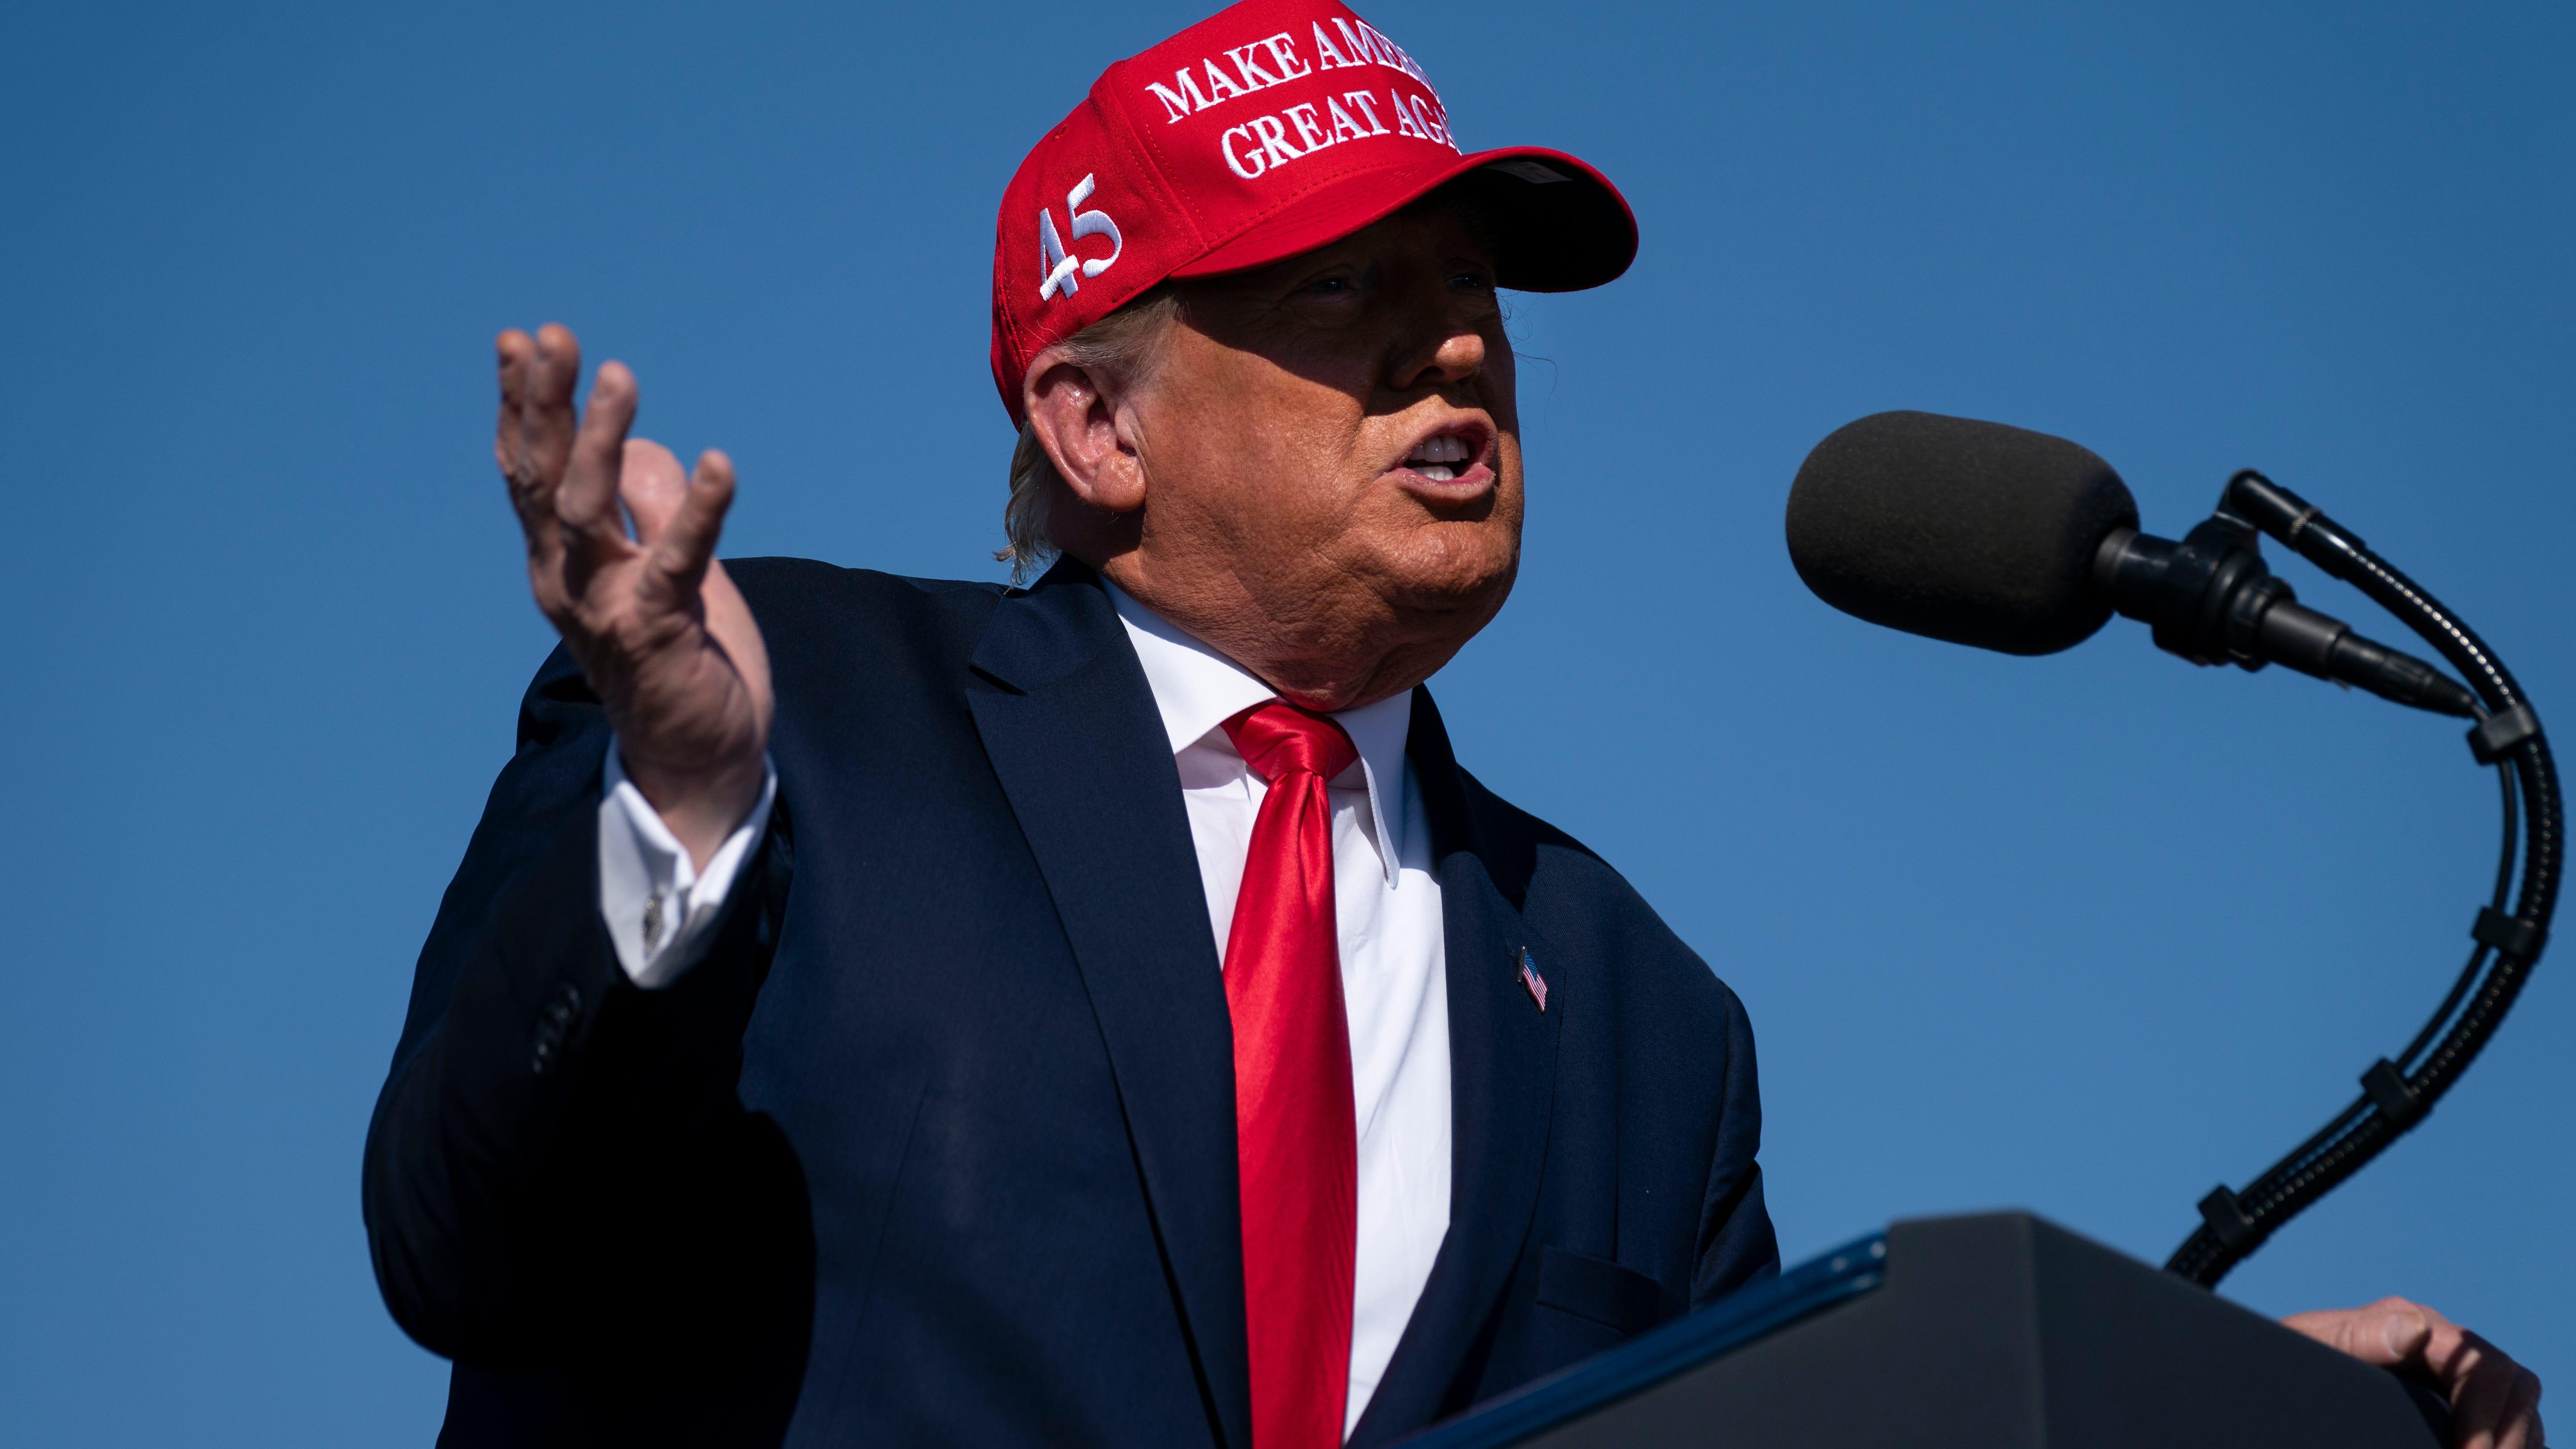 Conservatives should reject Trump, vote Biden to preserve US moral core